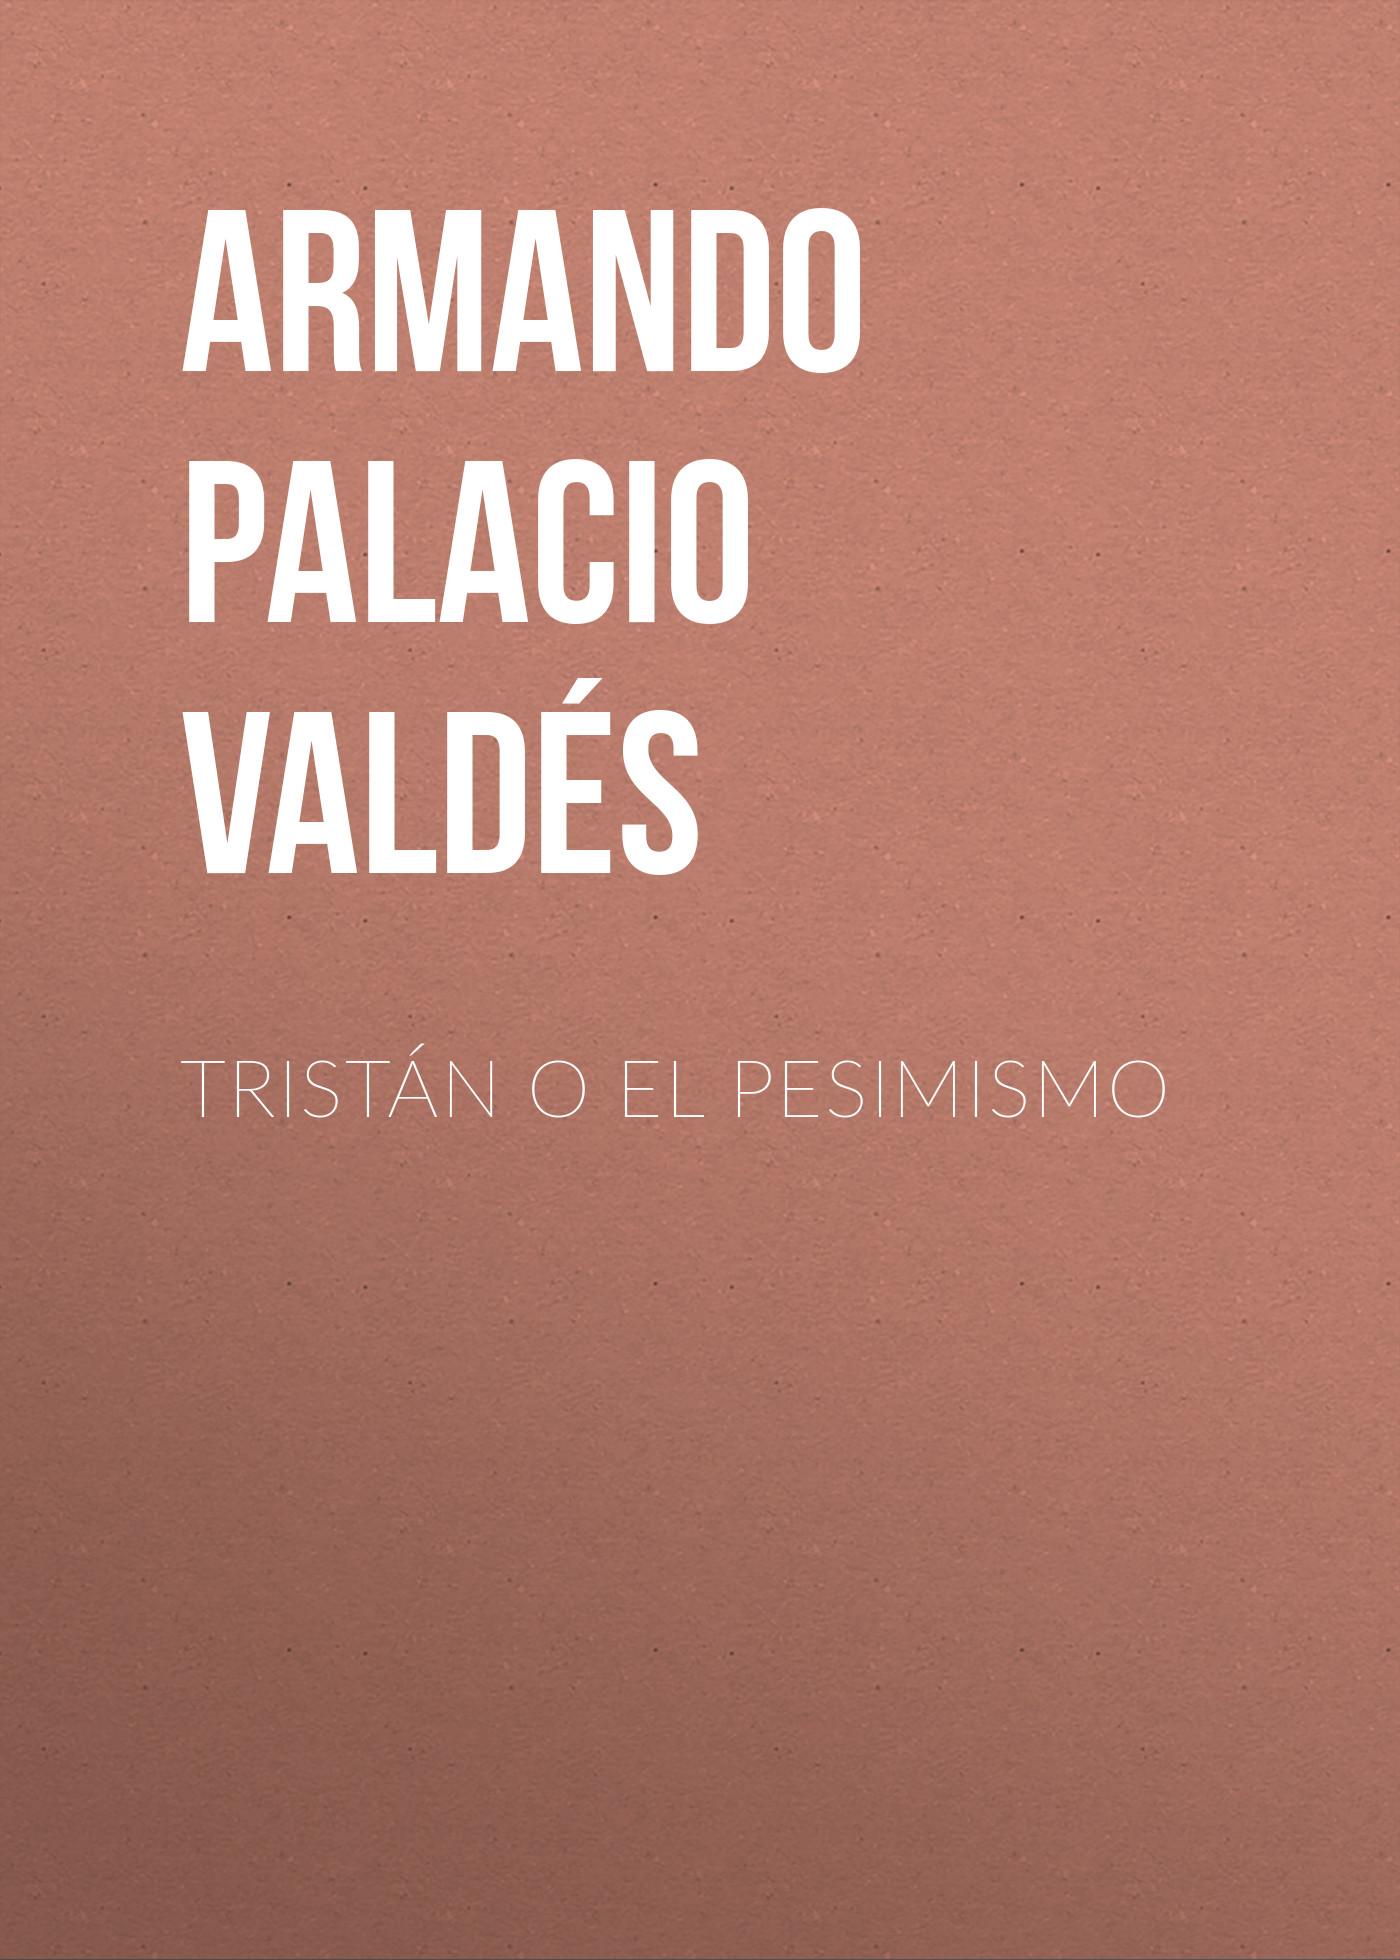 Armando Palacio Valdés Tristán o el pesimismo цена и фото